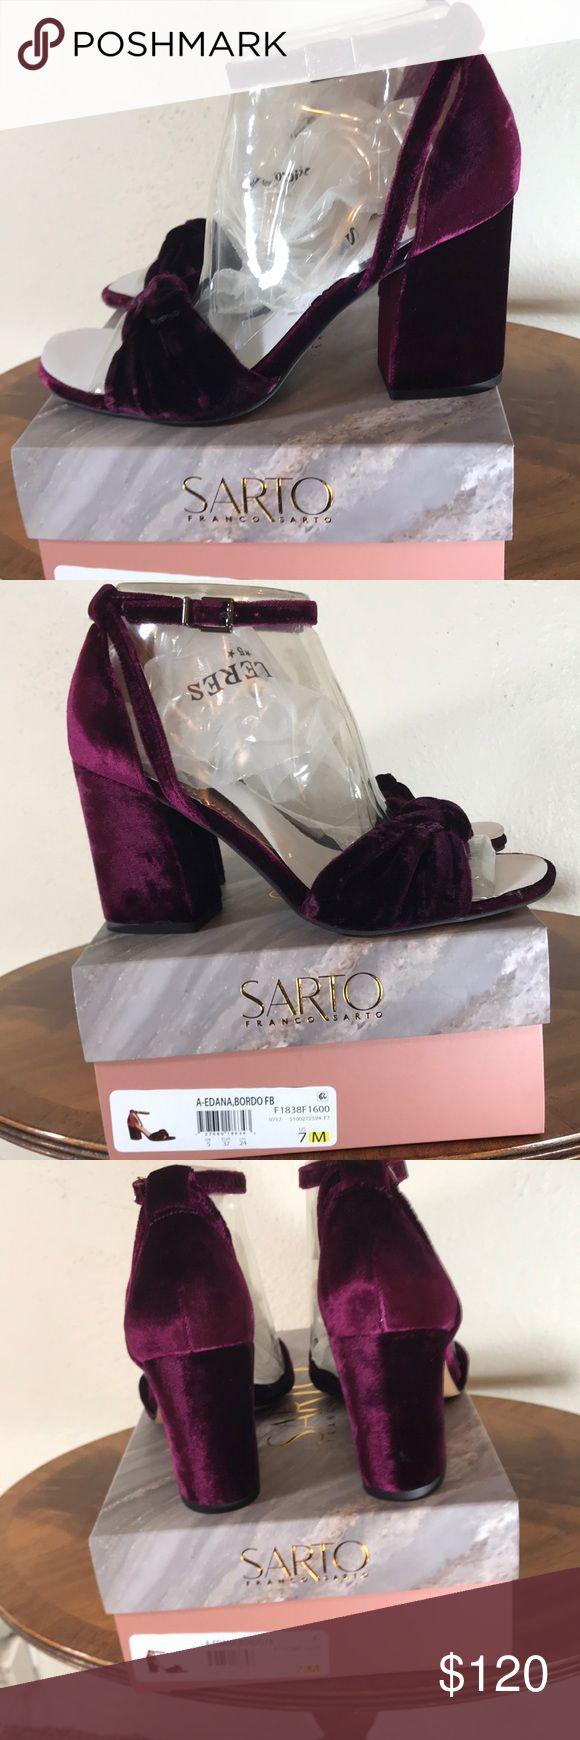 Anthropologie A-Edana, Bordo. Franco Sarto Anthropologie A-Edana, Bordo high heels. Velvet plum. Heel length 3 1/4. By Franco Sarto. NWT. New in box. So cute! Anthropologie Shoes Heels